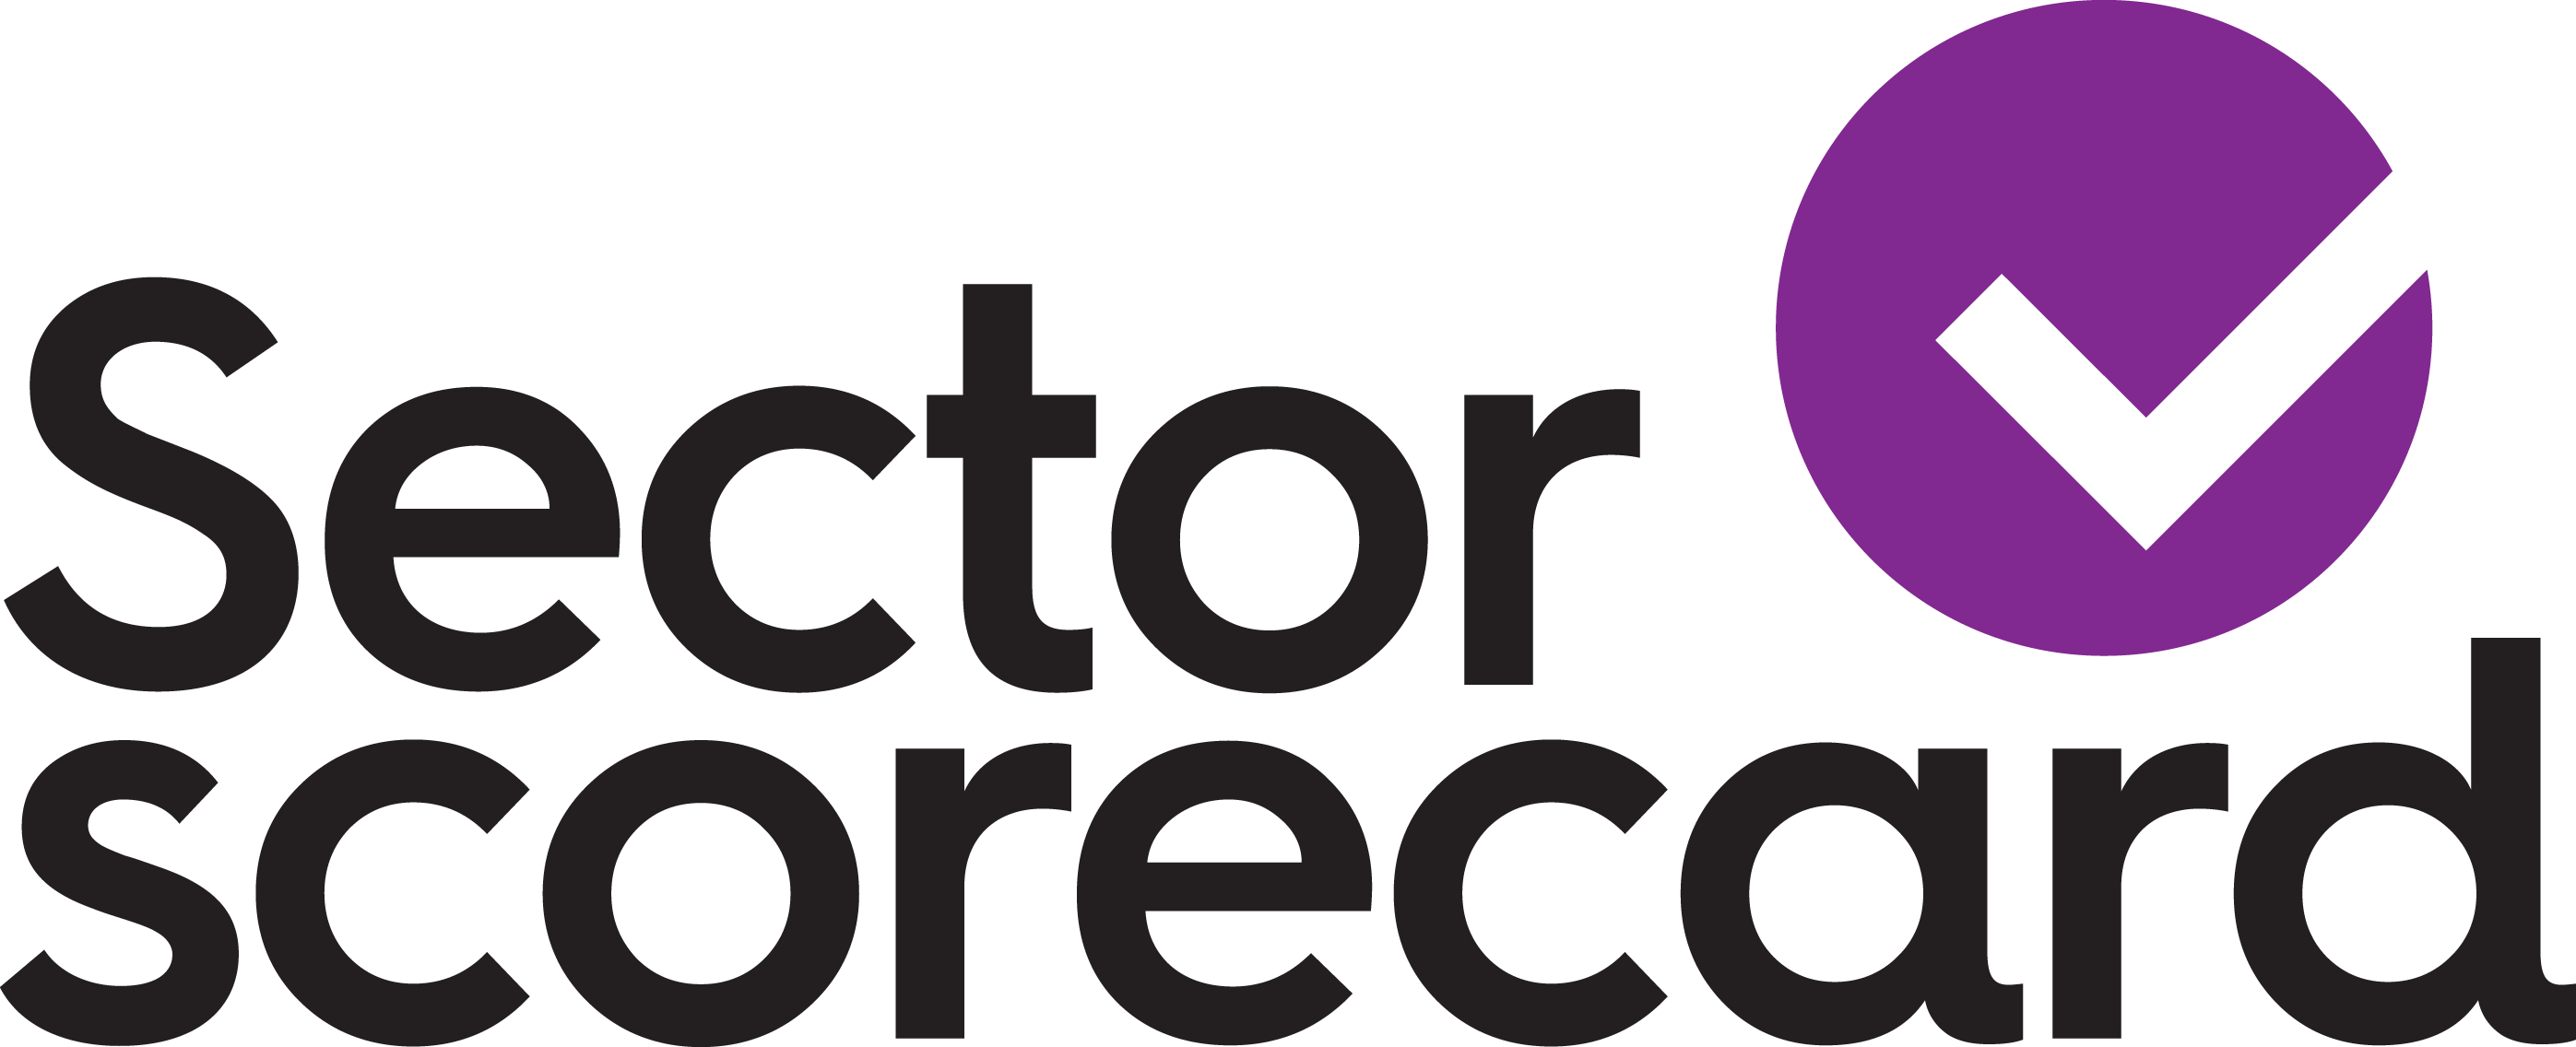 Sector Scorecard